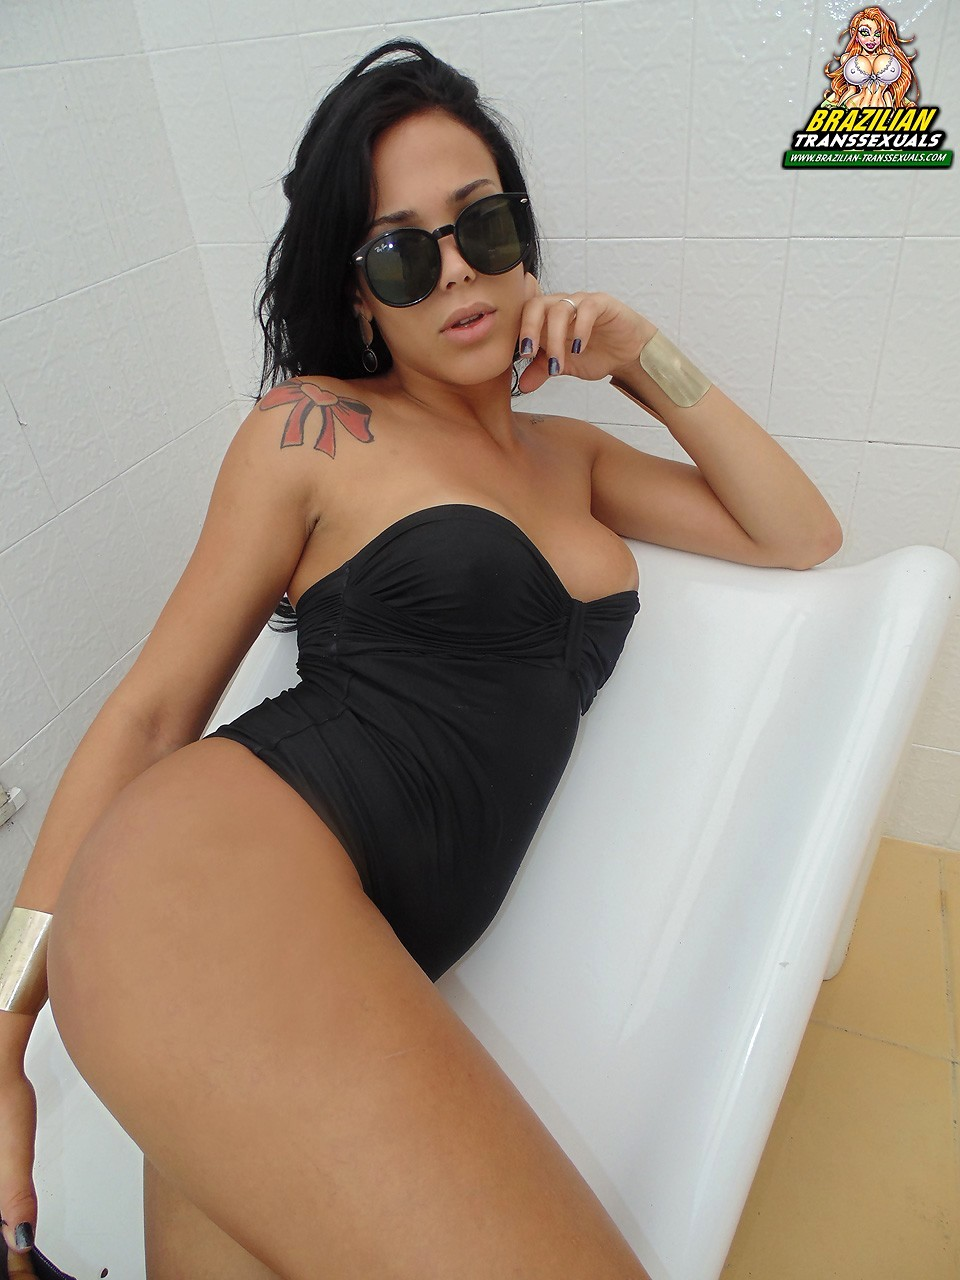 Transexual Juliana Soares Enjoying Herself